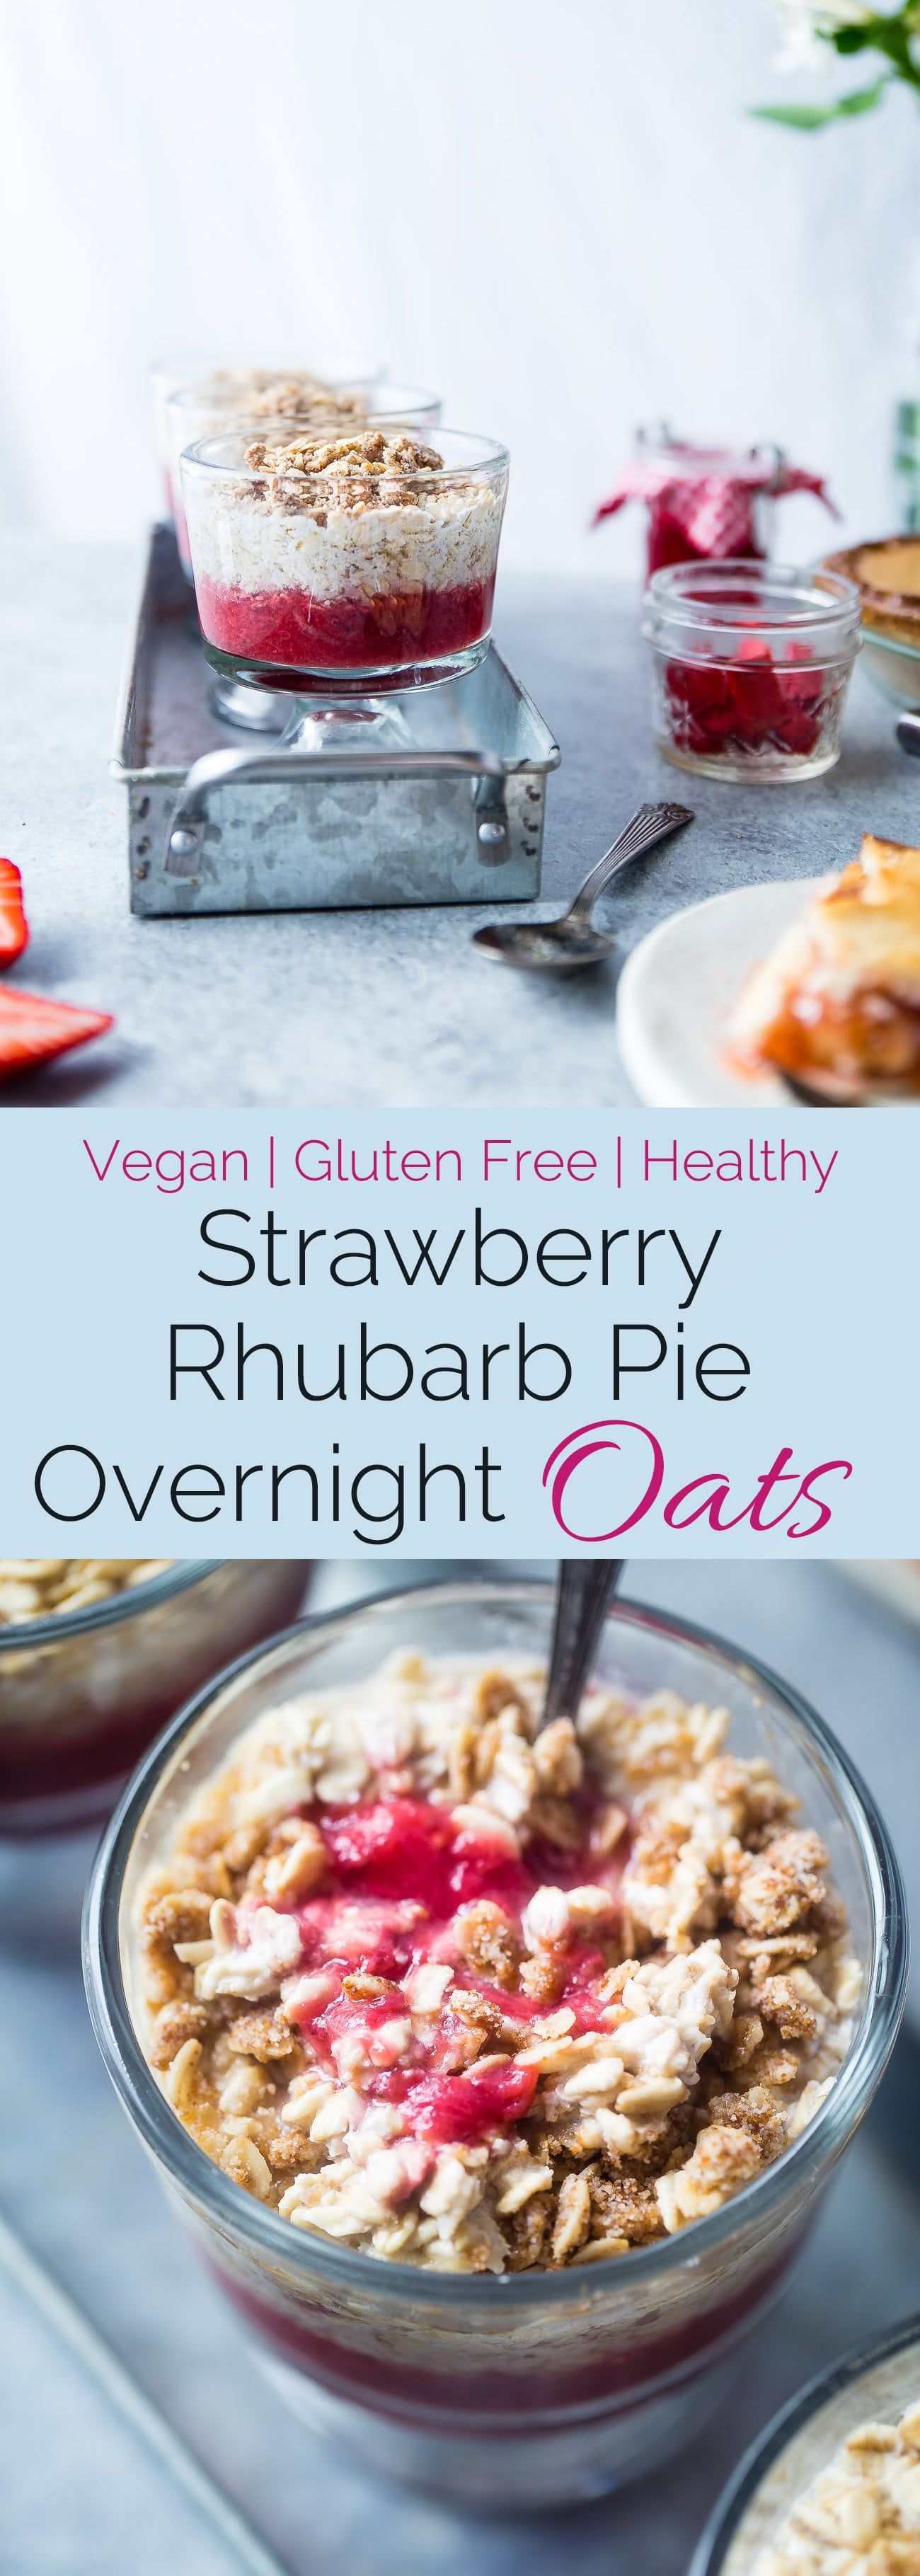 Strawberry Rhubarb Vegan Overnight Oats | Recipe | Gluten free, Free ...